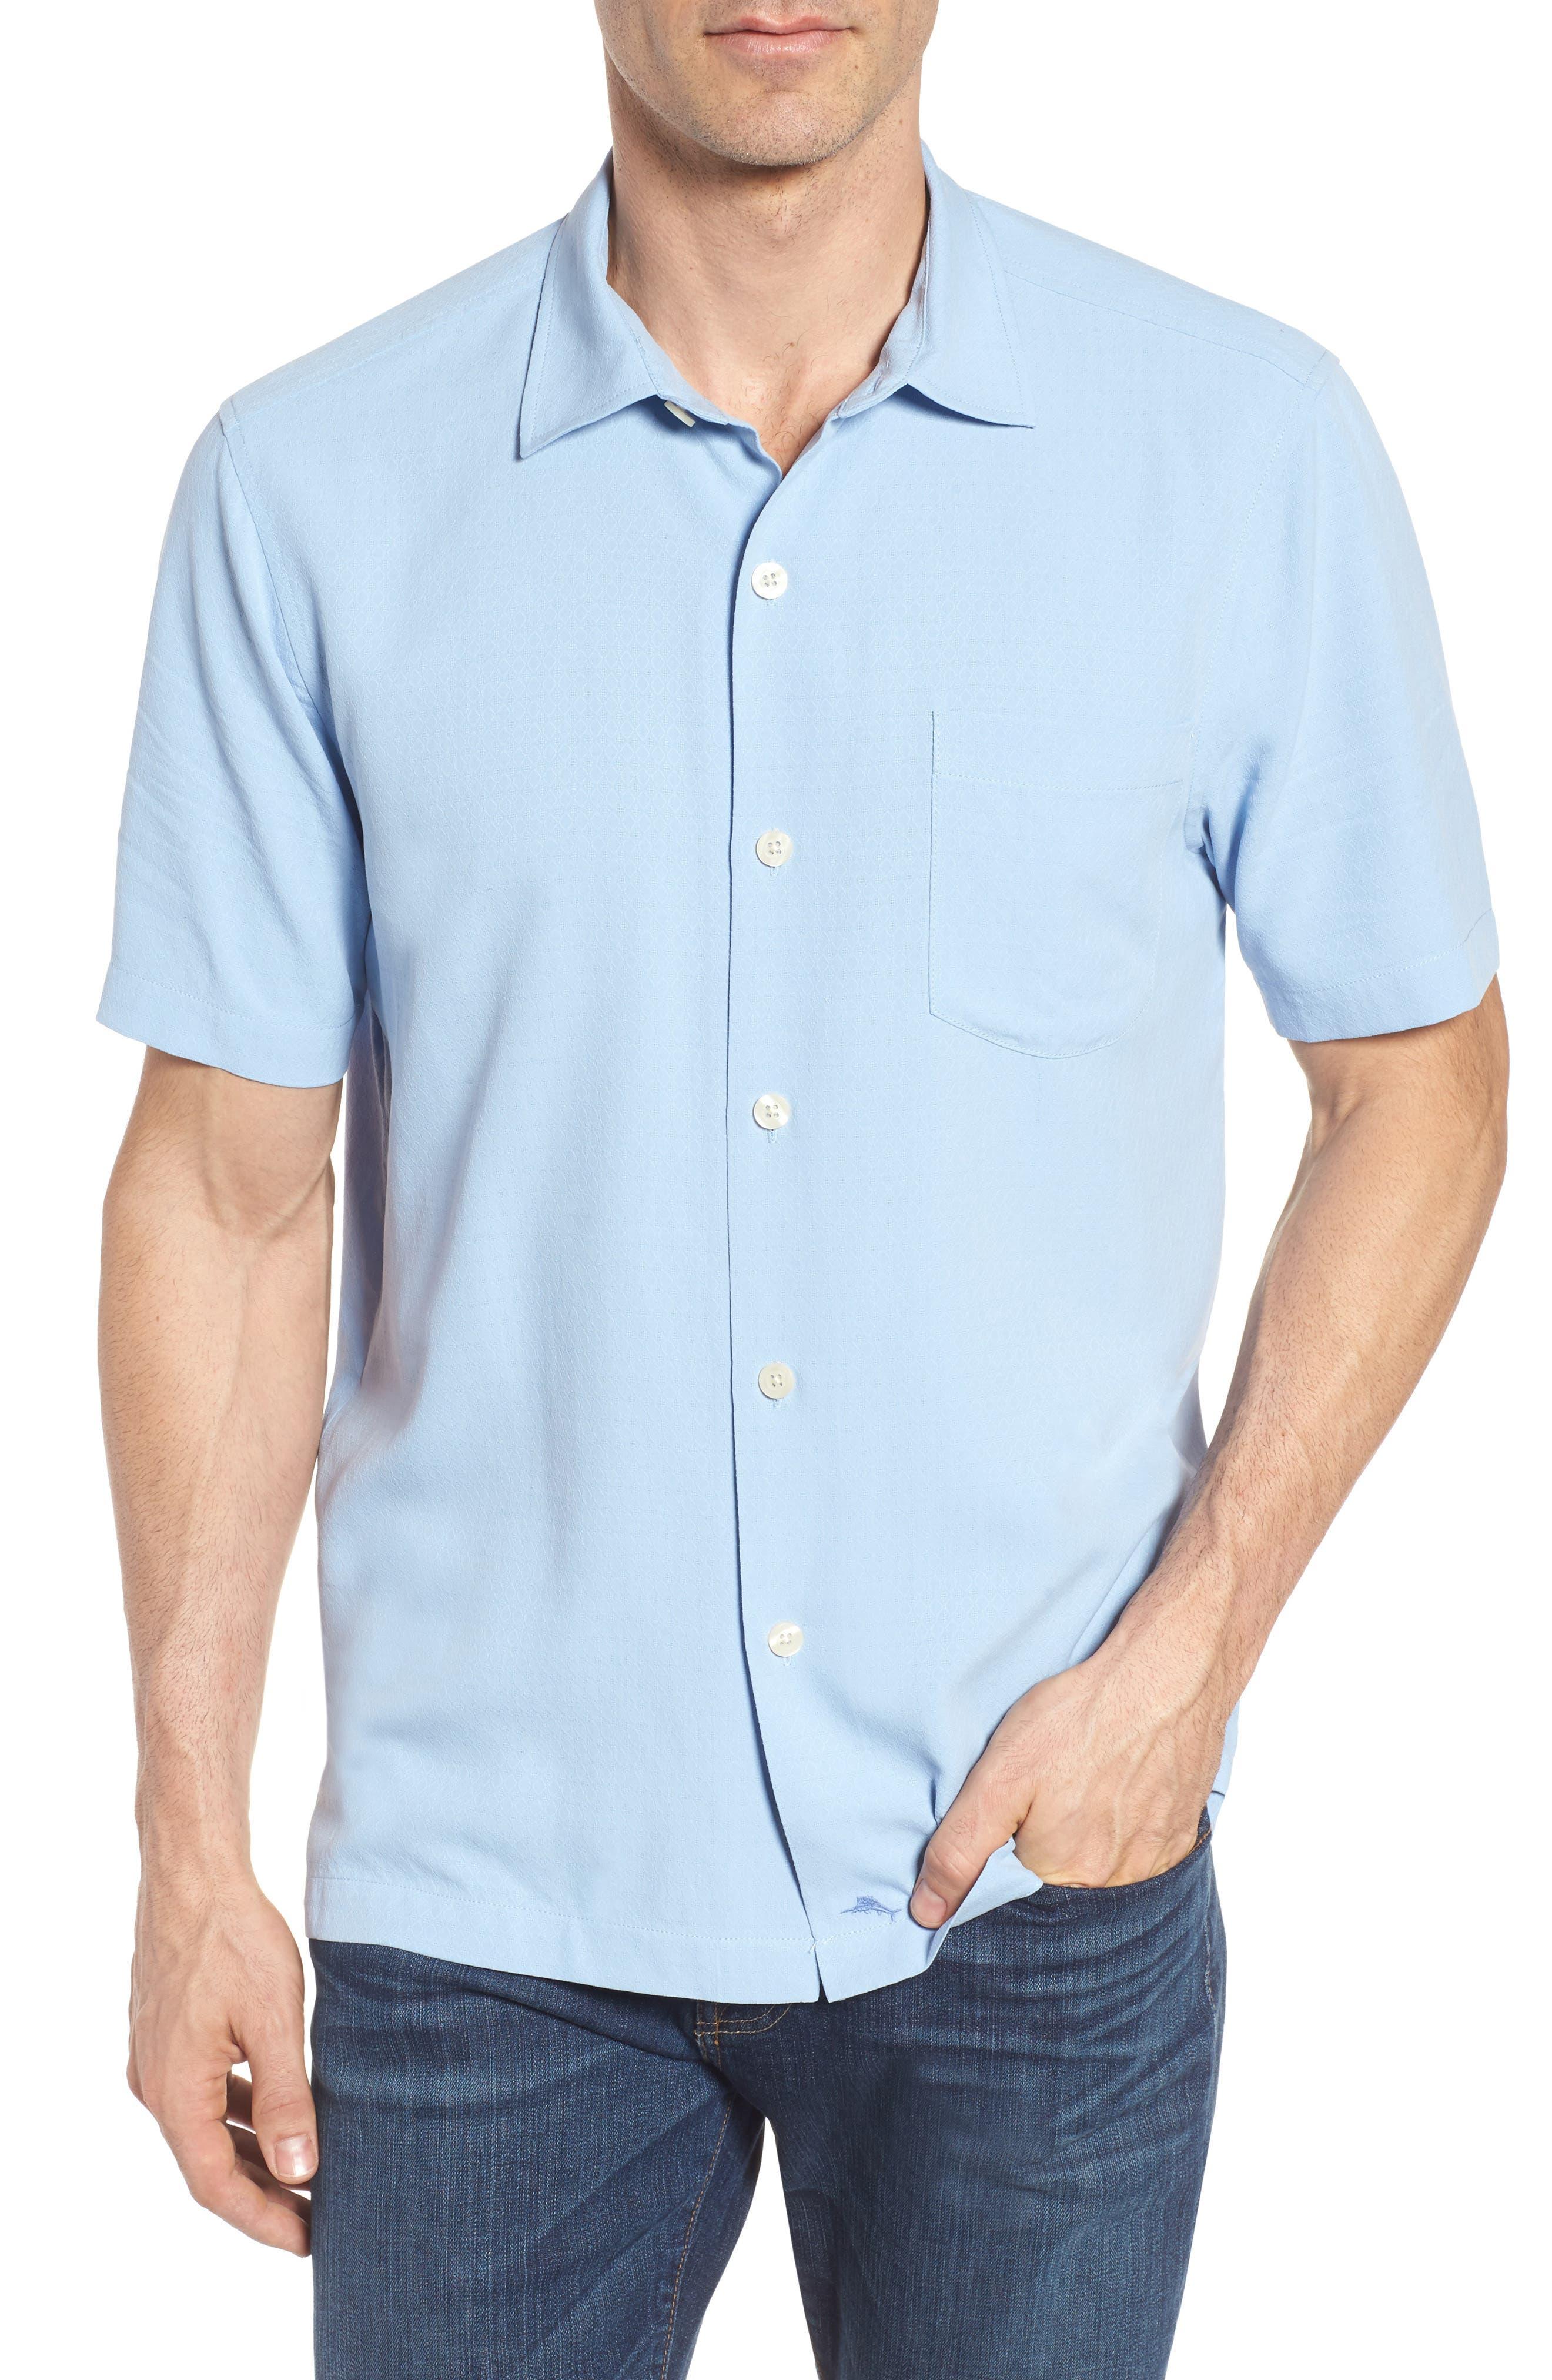 Oasis Jacquard Silk Sport Shirt,                         Main,                         color, 400